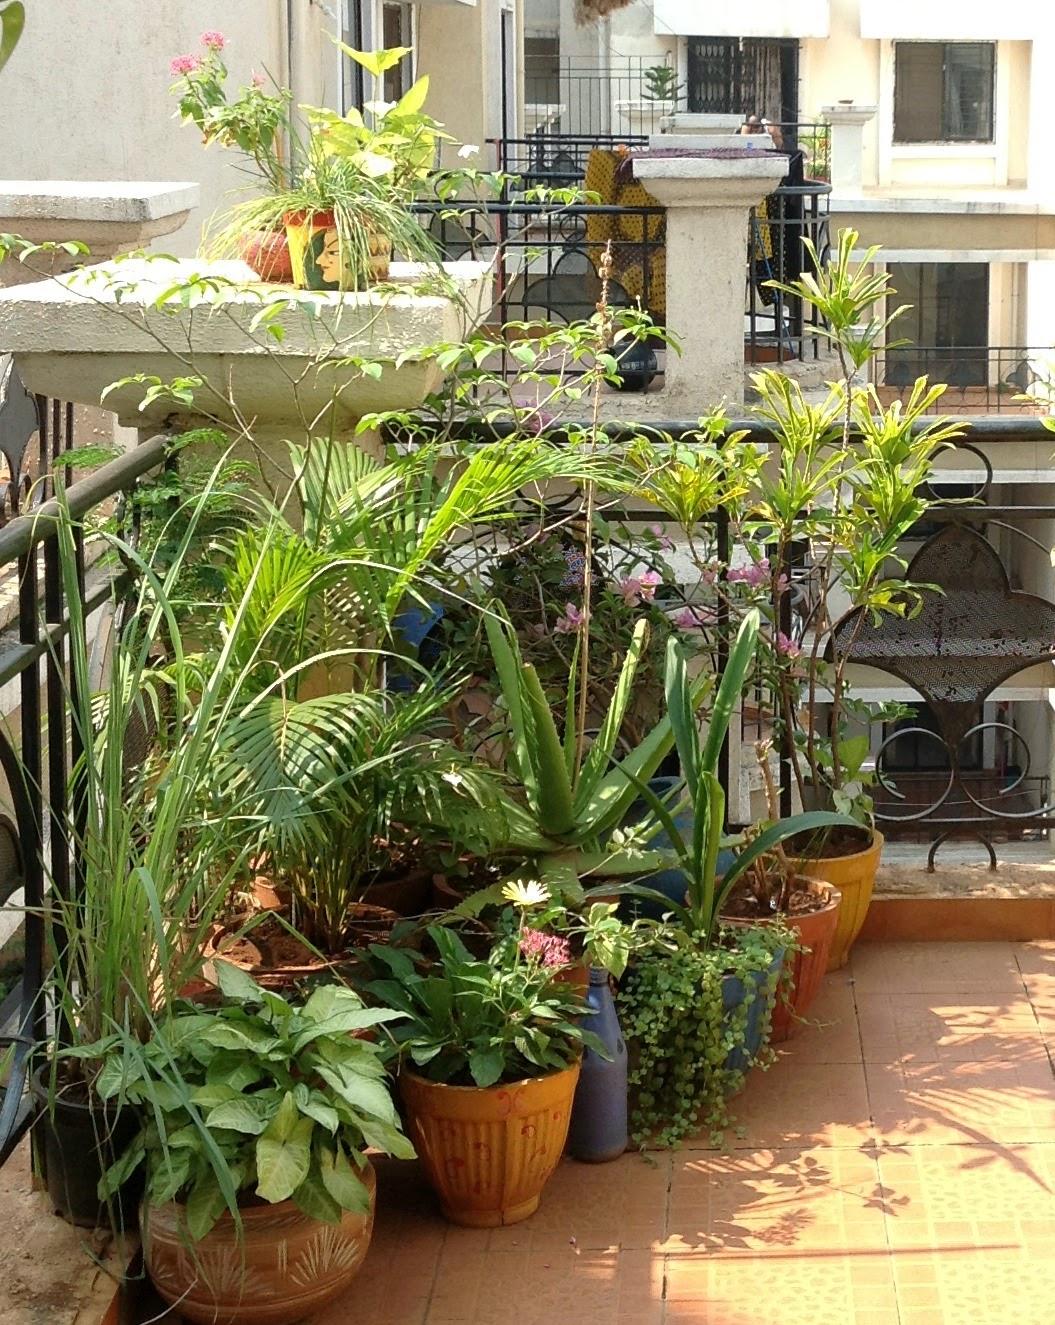 Apartment Balcony Indian Balcony Garden Decoration Ideas Home Designs Inspiration